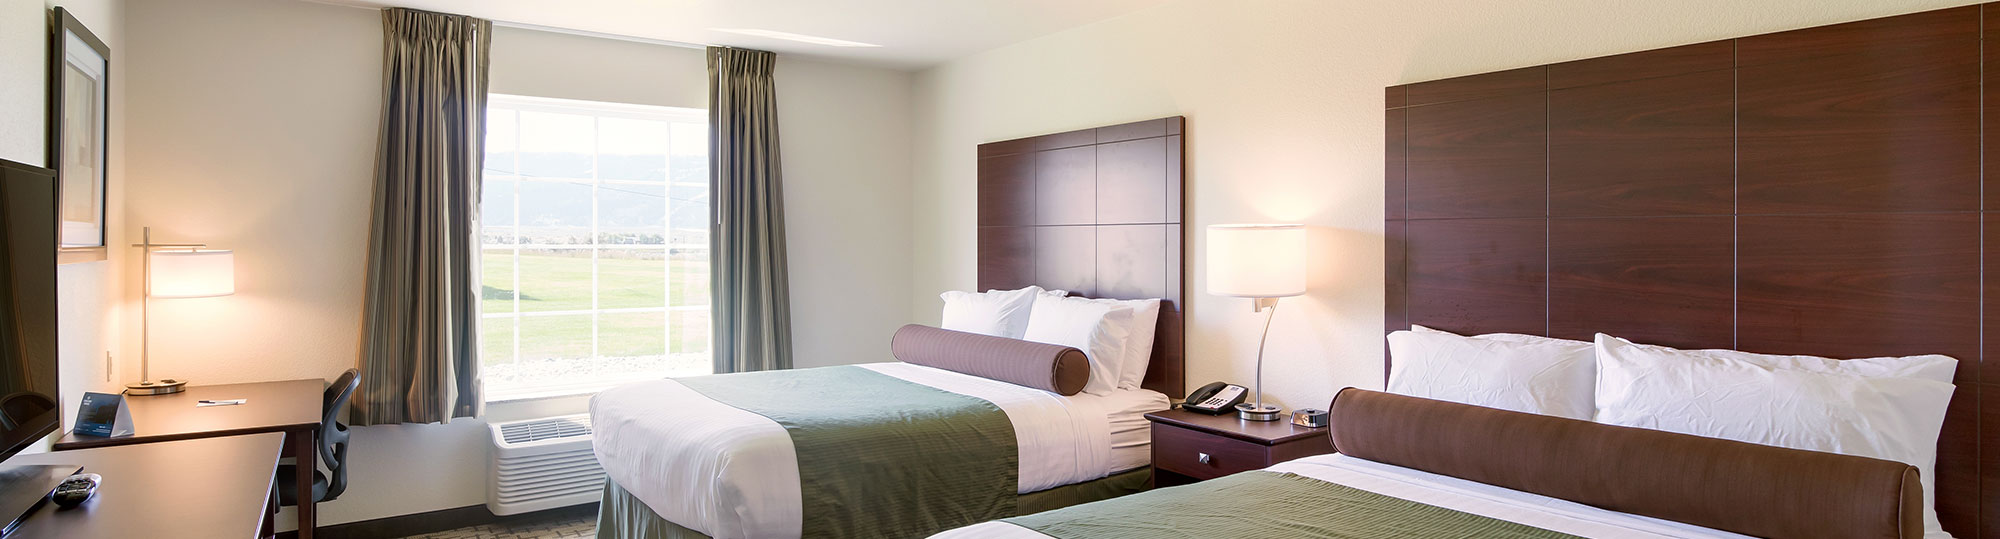 Cobblestone Inn & Suites Soda Springs